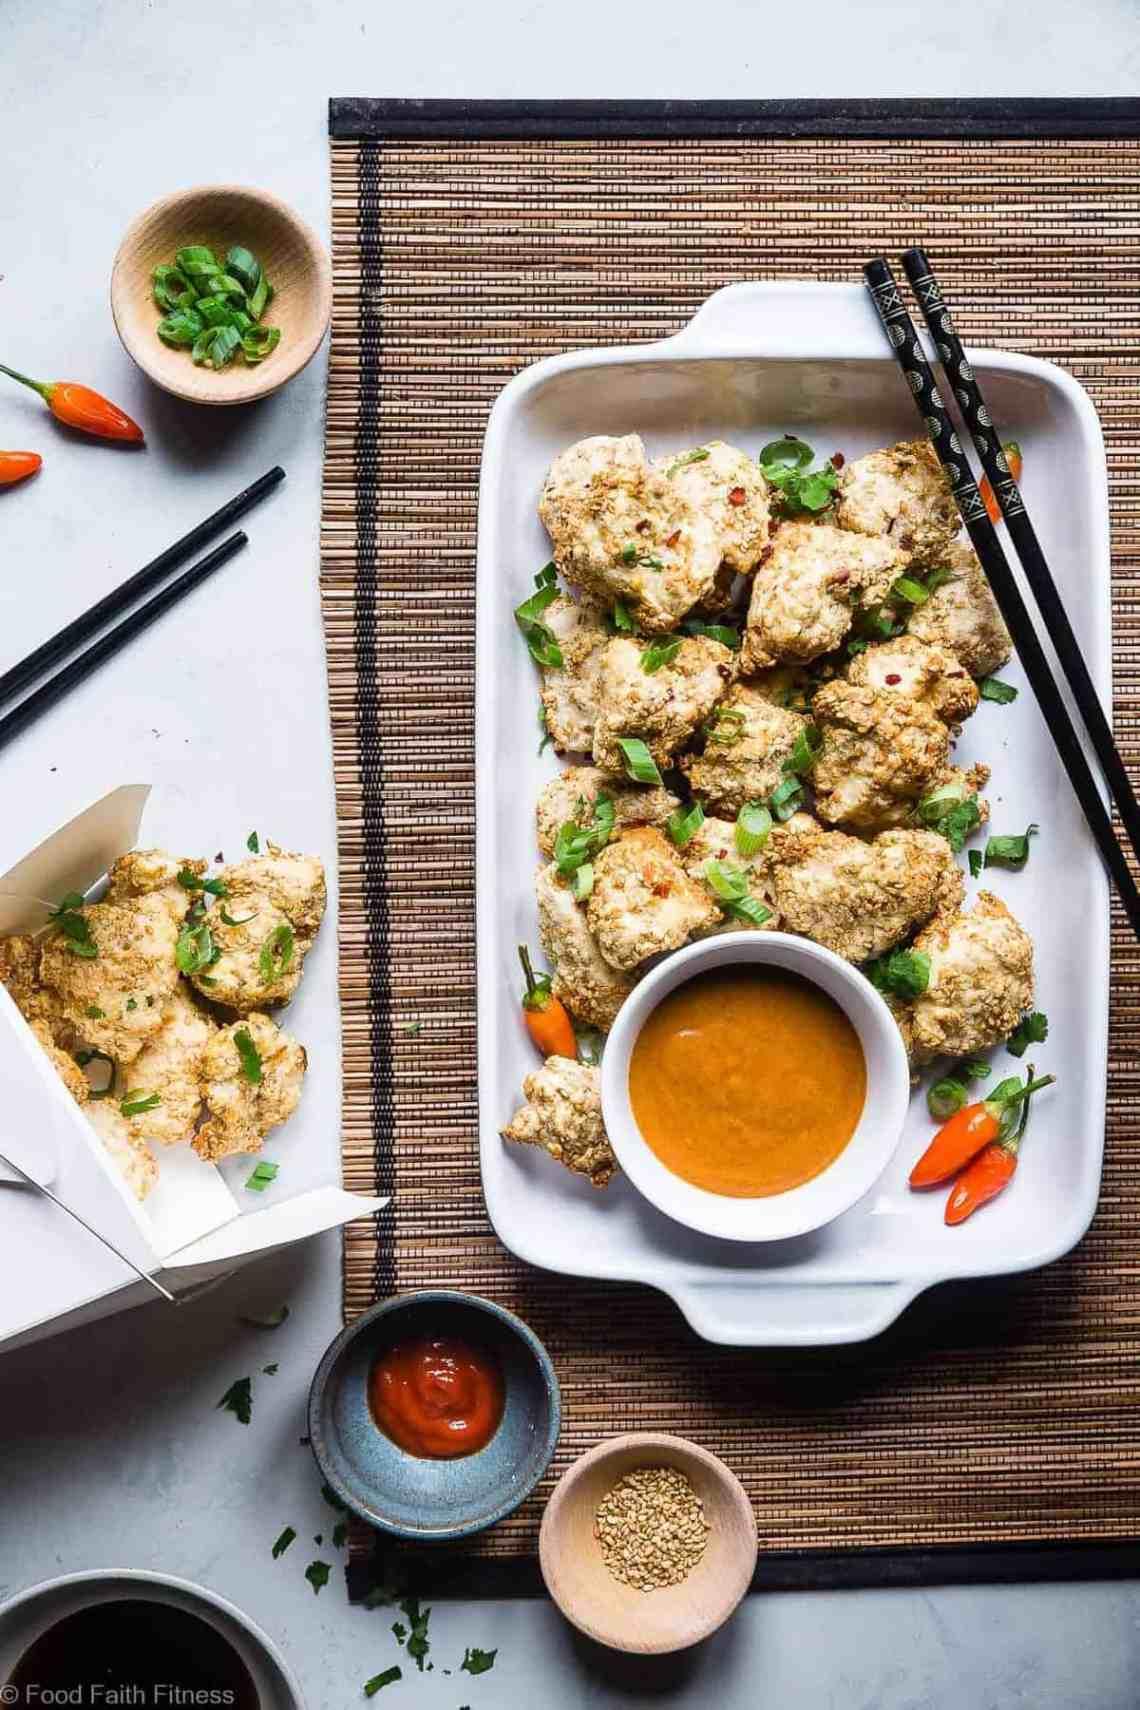 20 Gluten Free Healthy Air Fryer Recipes | Food Faith Fitness